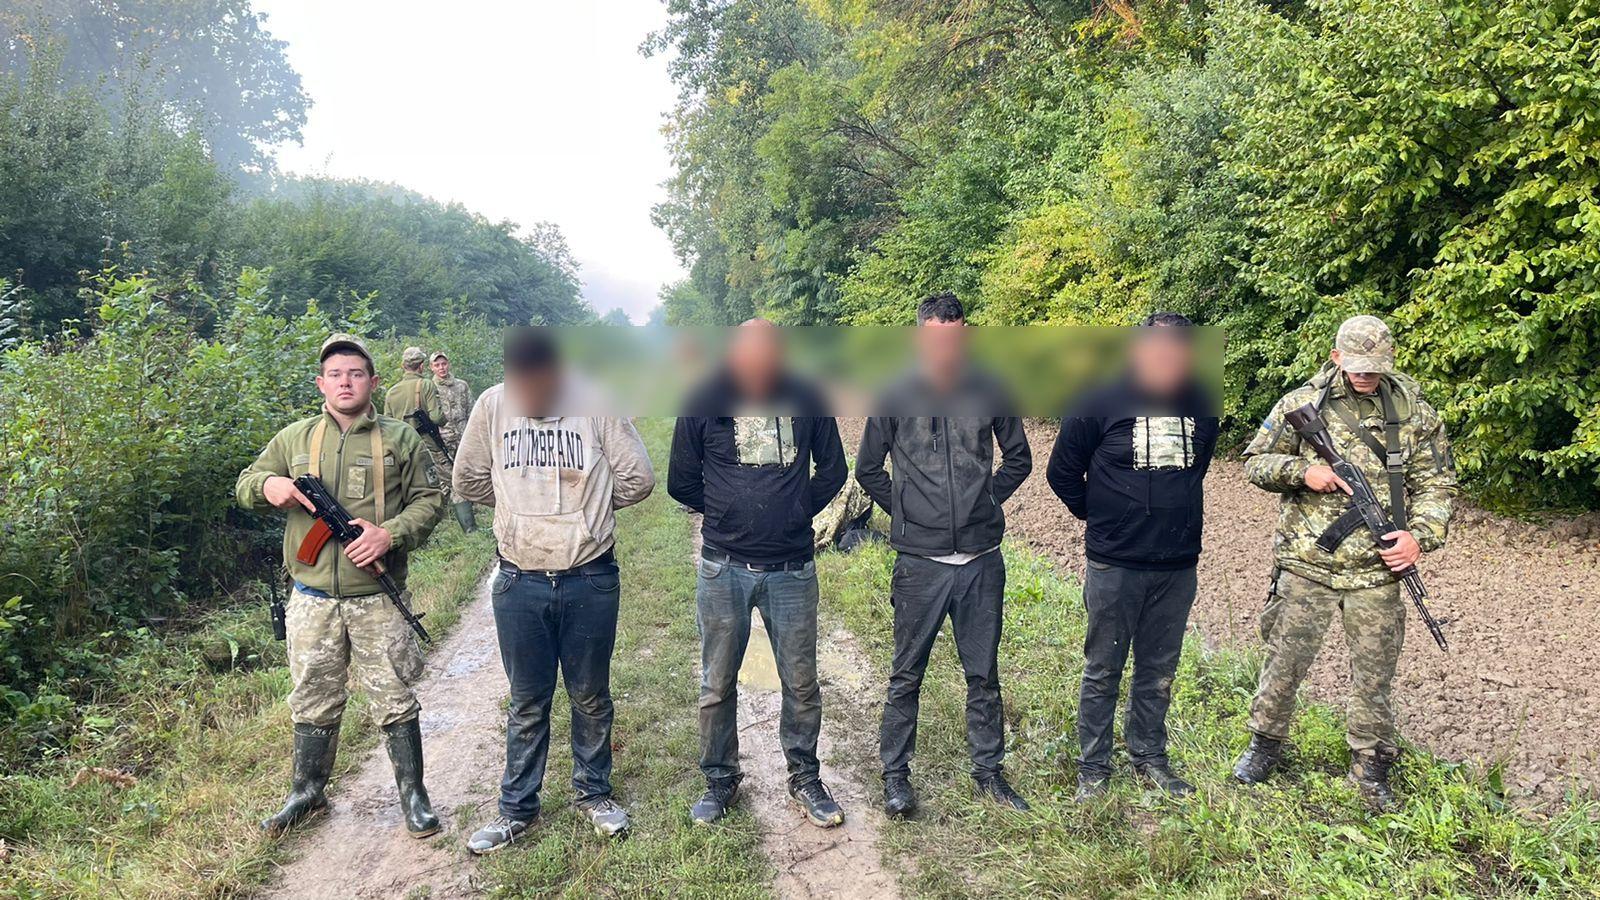 Поблизу кордону затримали 4 турків